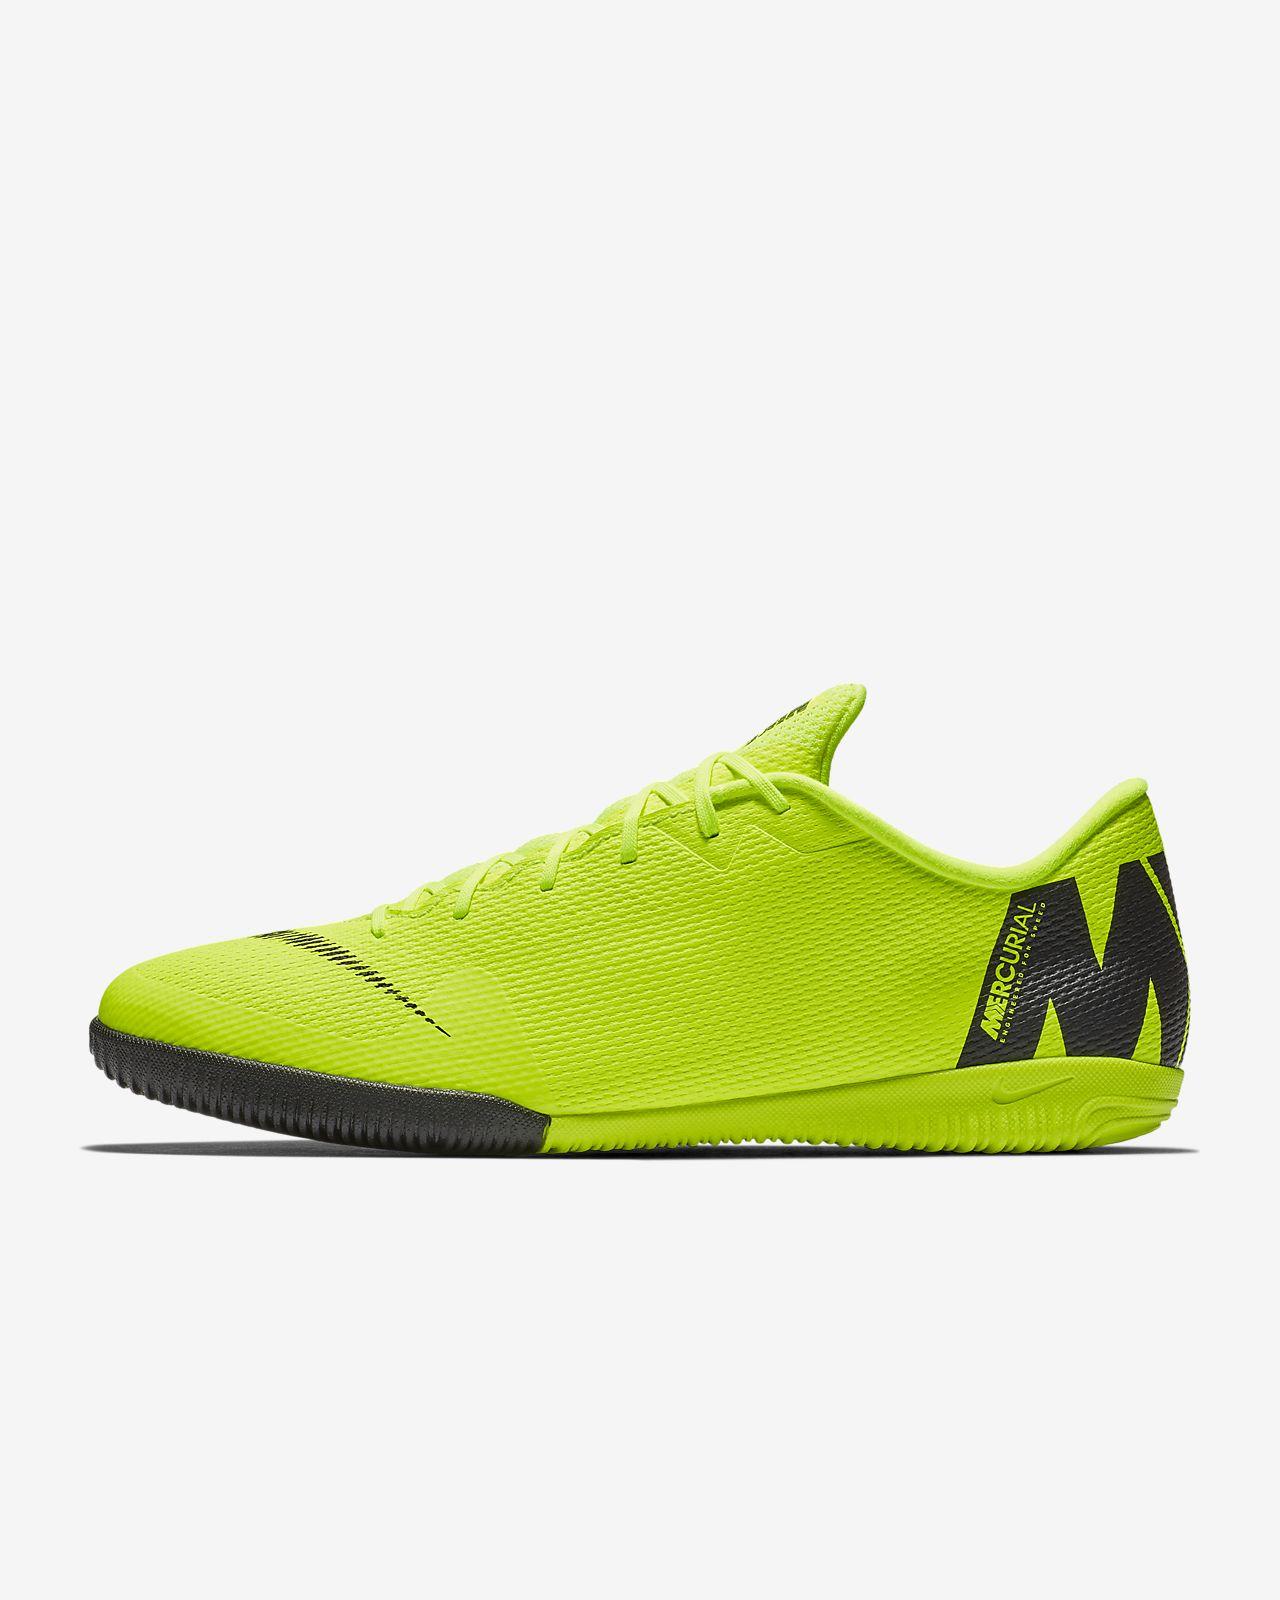 new style 54aa5 fdf23 ... Nike VaporX 12 Academy IC Indoor Court Football Boot